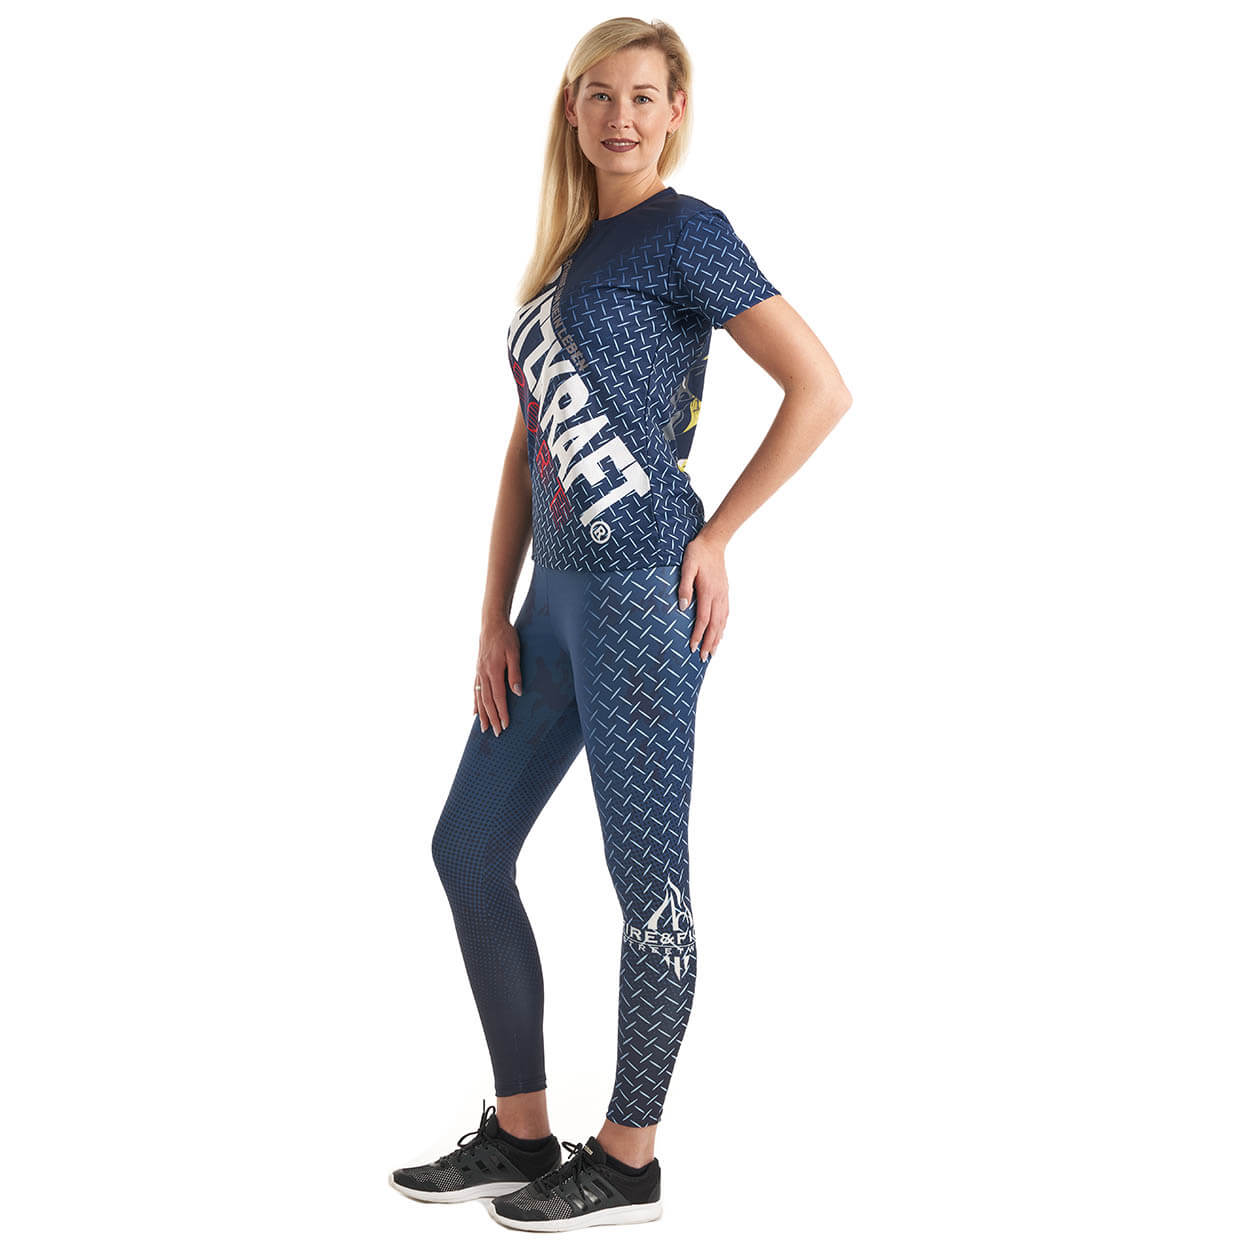 EINSATZKRAFT® Laufsport Leggings Frauen